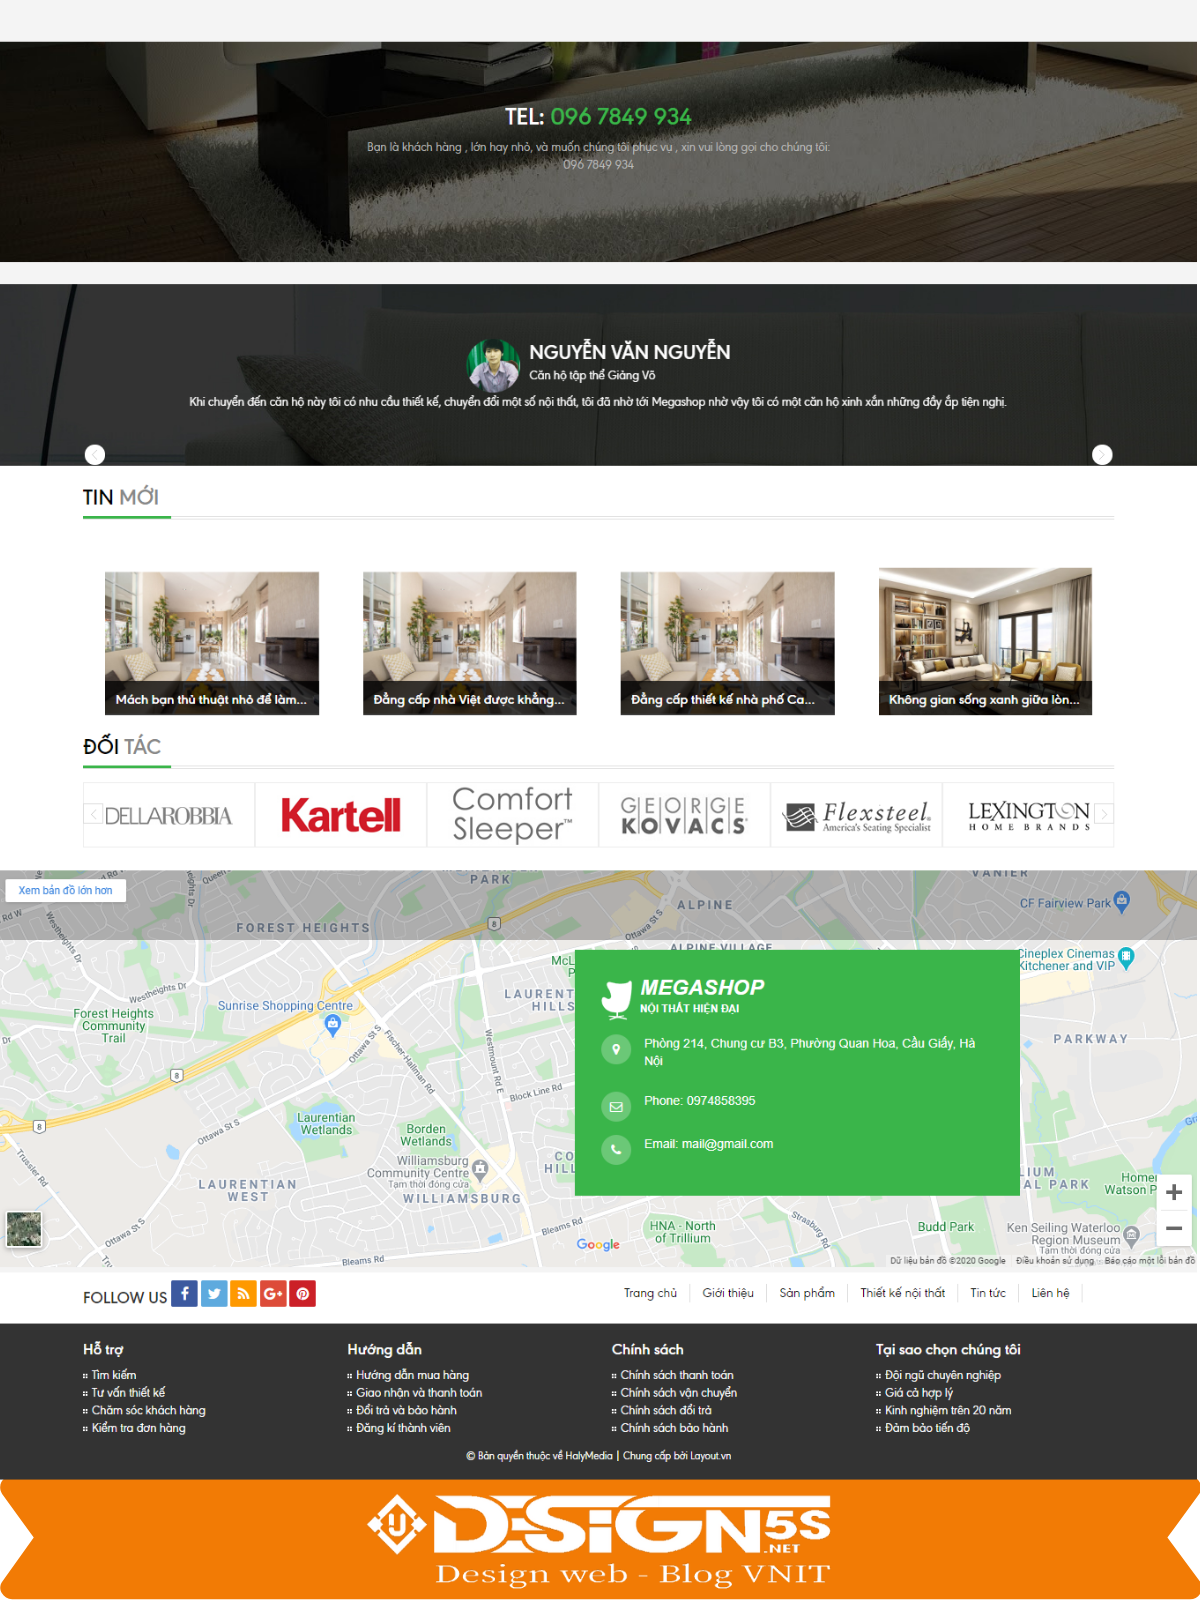 Mẫu Website Thiết Kế Nội Thất Megashop Chuẩn Seo - Ảnh 2